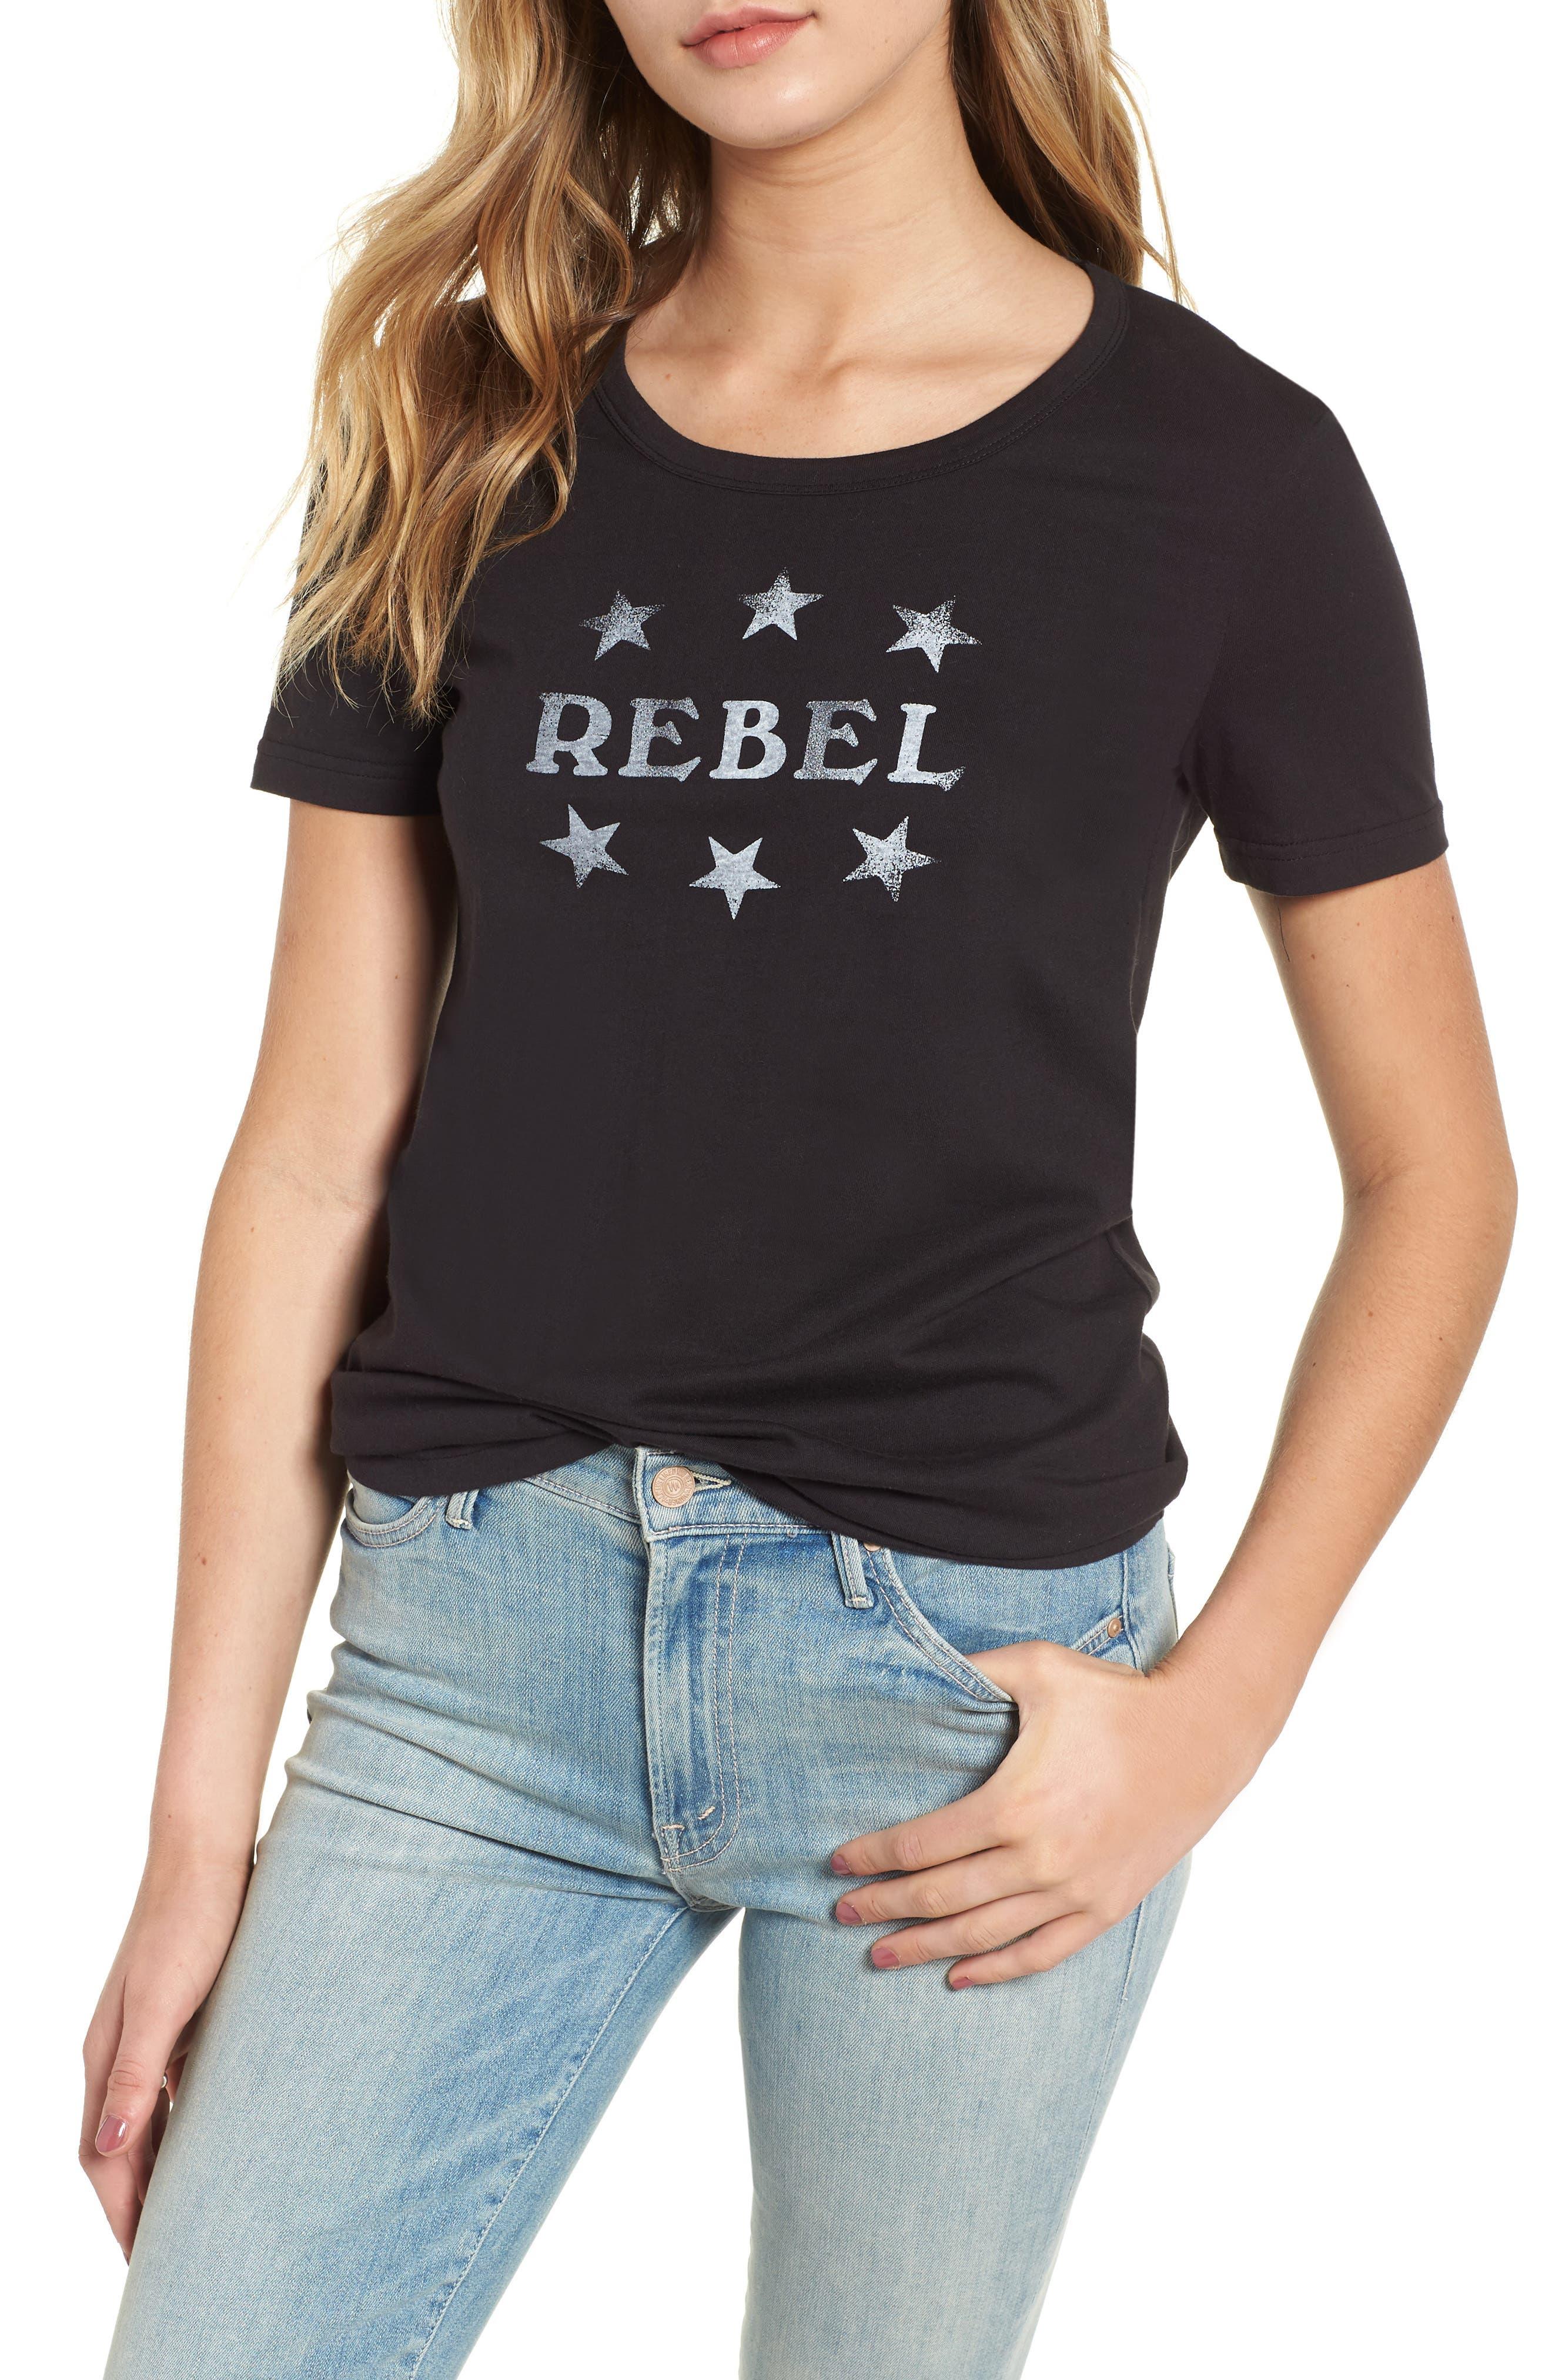 Rebel Ava Tee,                             Main thumbnail 1, color,                             BLACK/ WHITE